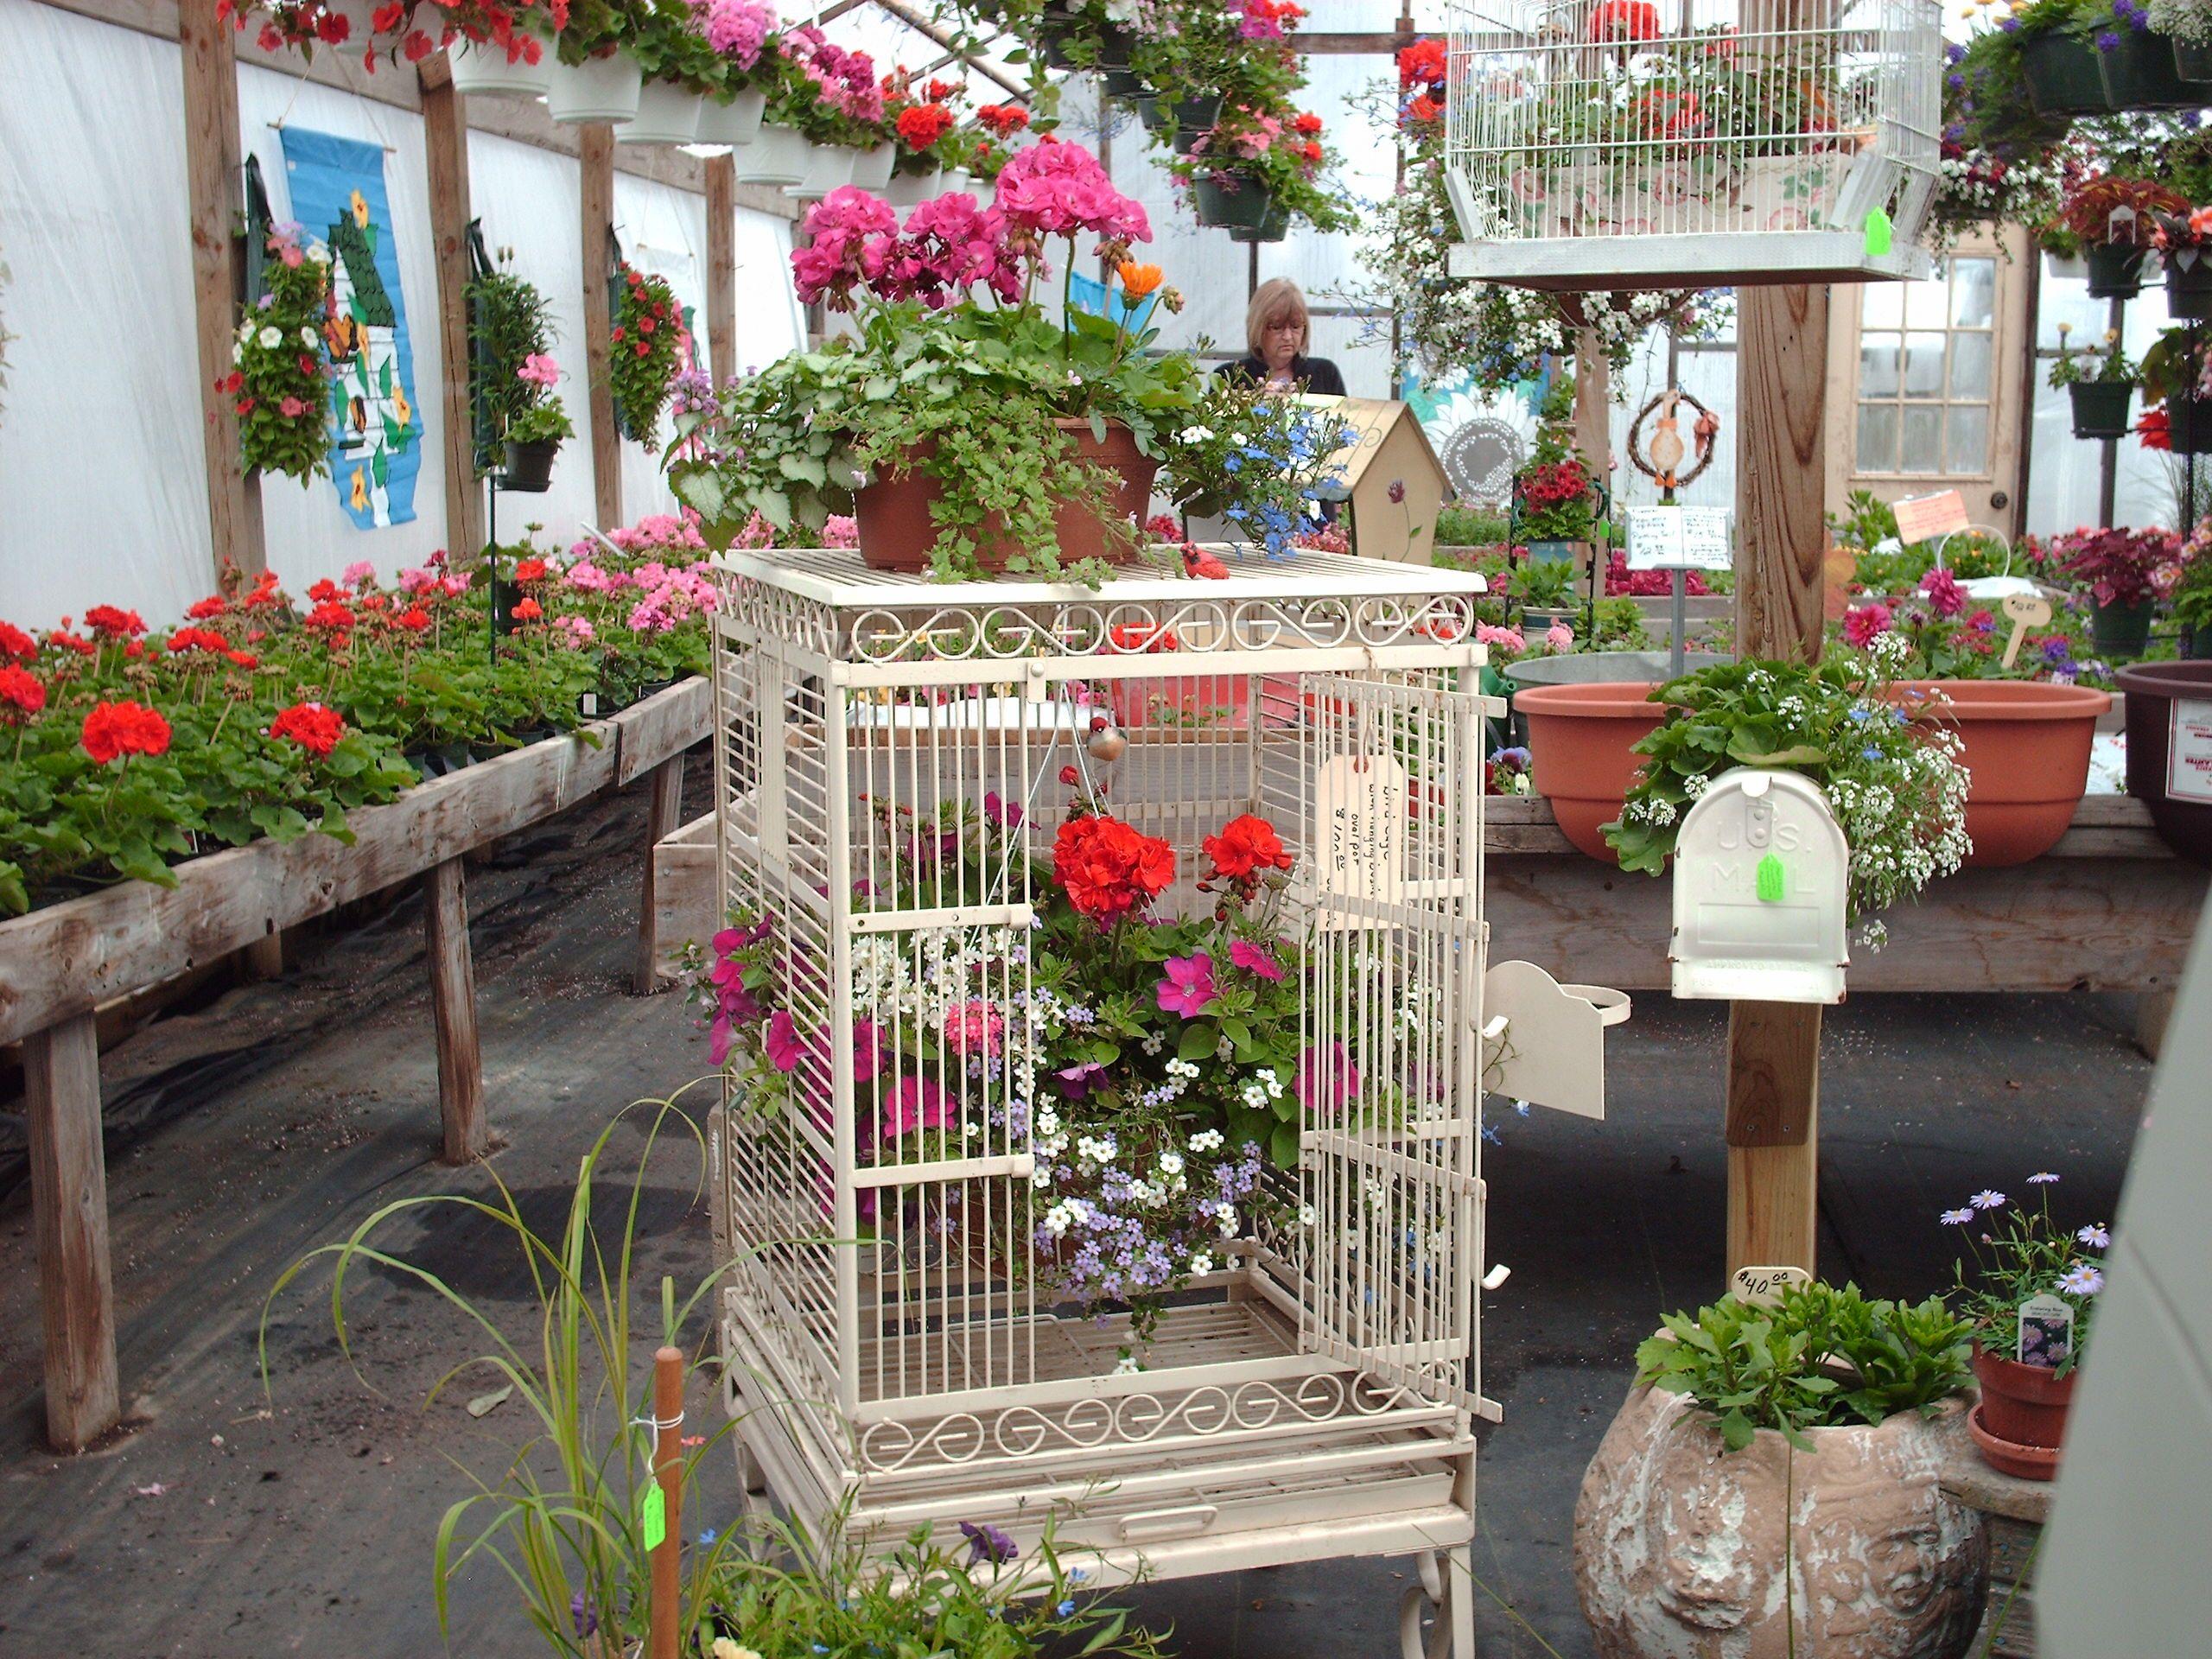 Superb Gustafsonu0027s Greenhouse And Garden Essentials, Ludington, ...